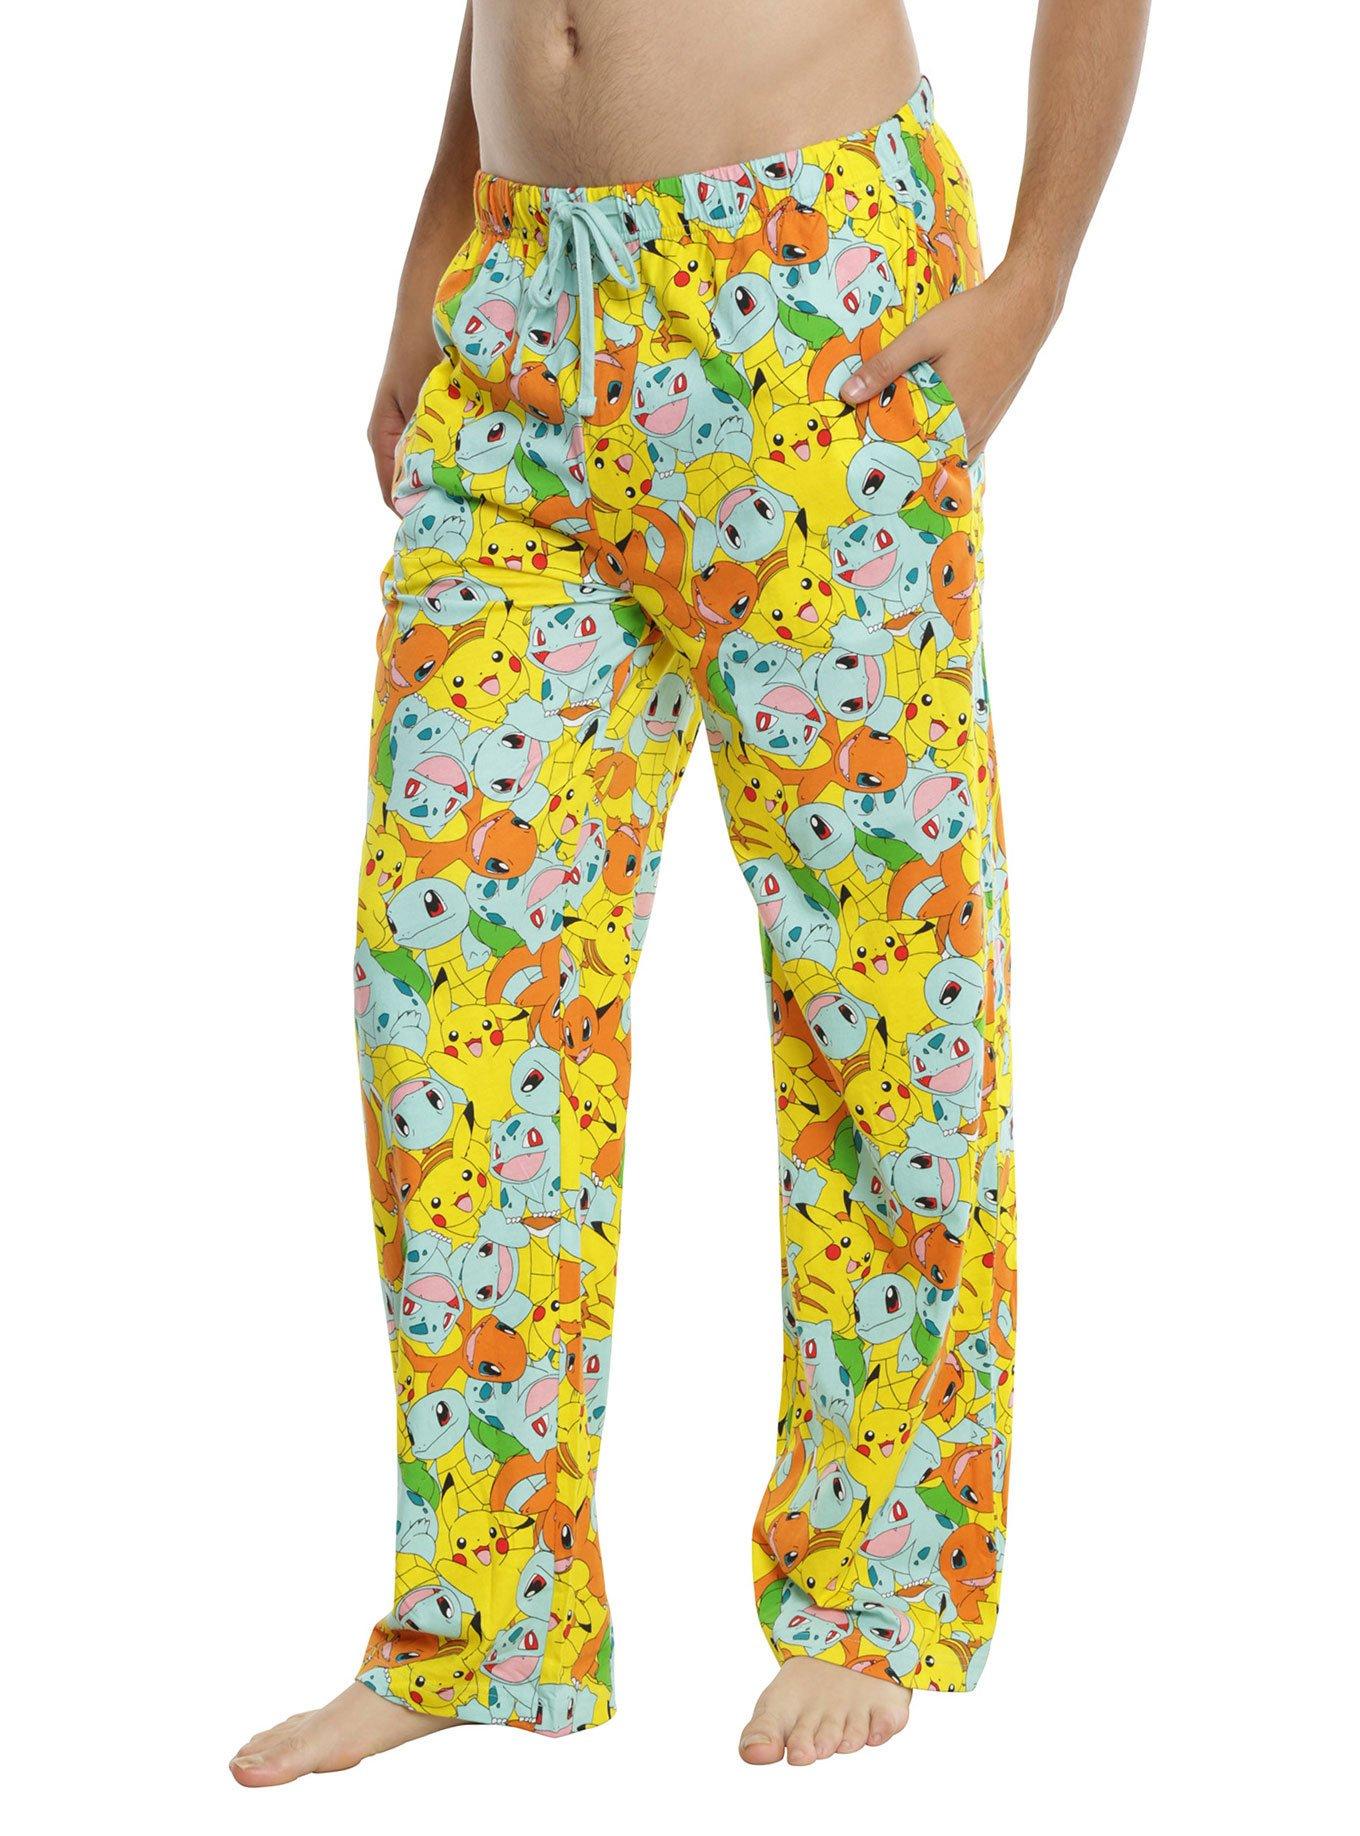 Underboss Unisex Mens Womens Pokemon Printed Yellow Lounge Pajama Pants with Elastic Drawstring Waist Small